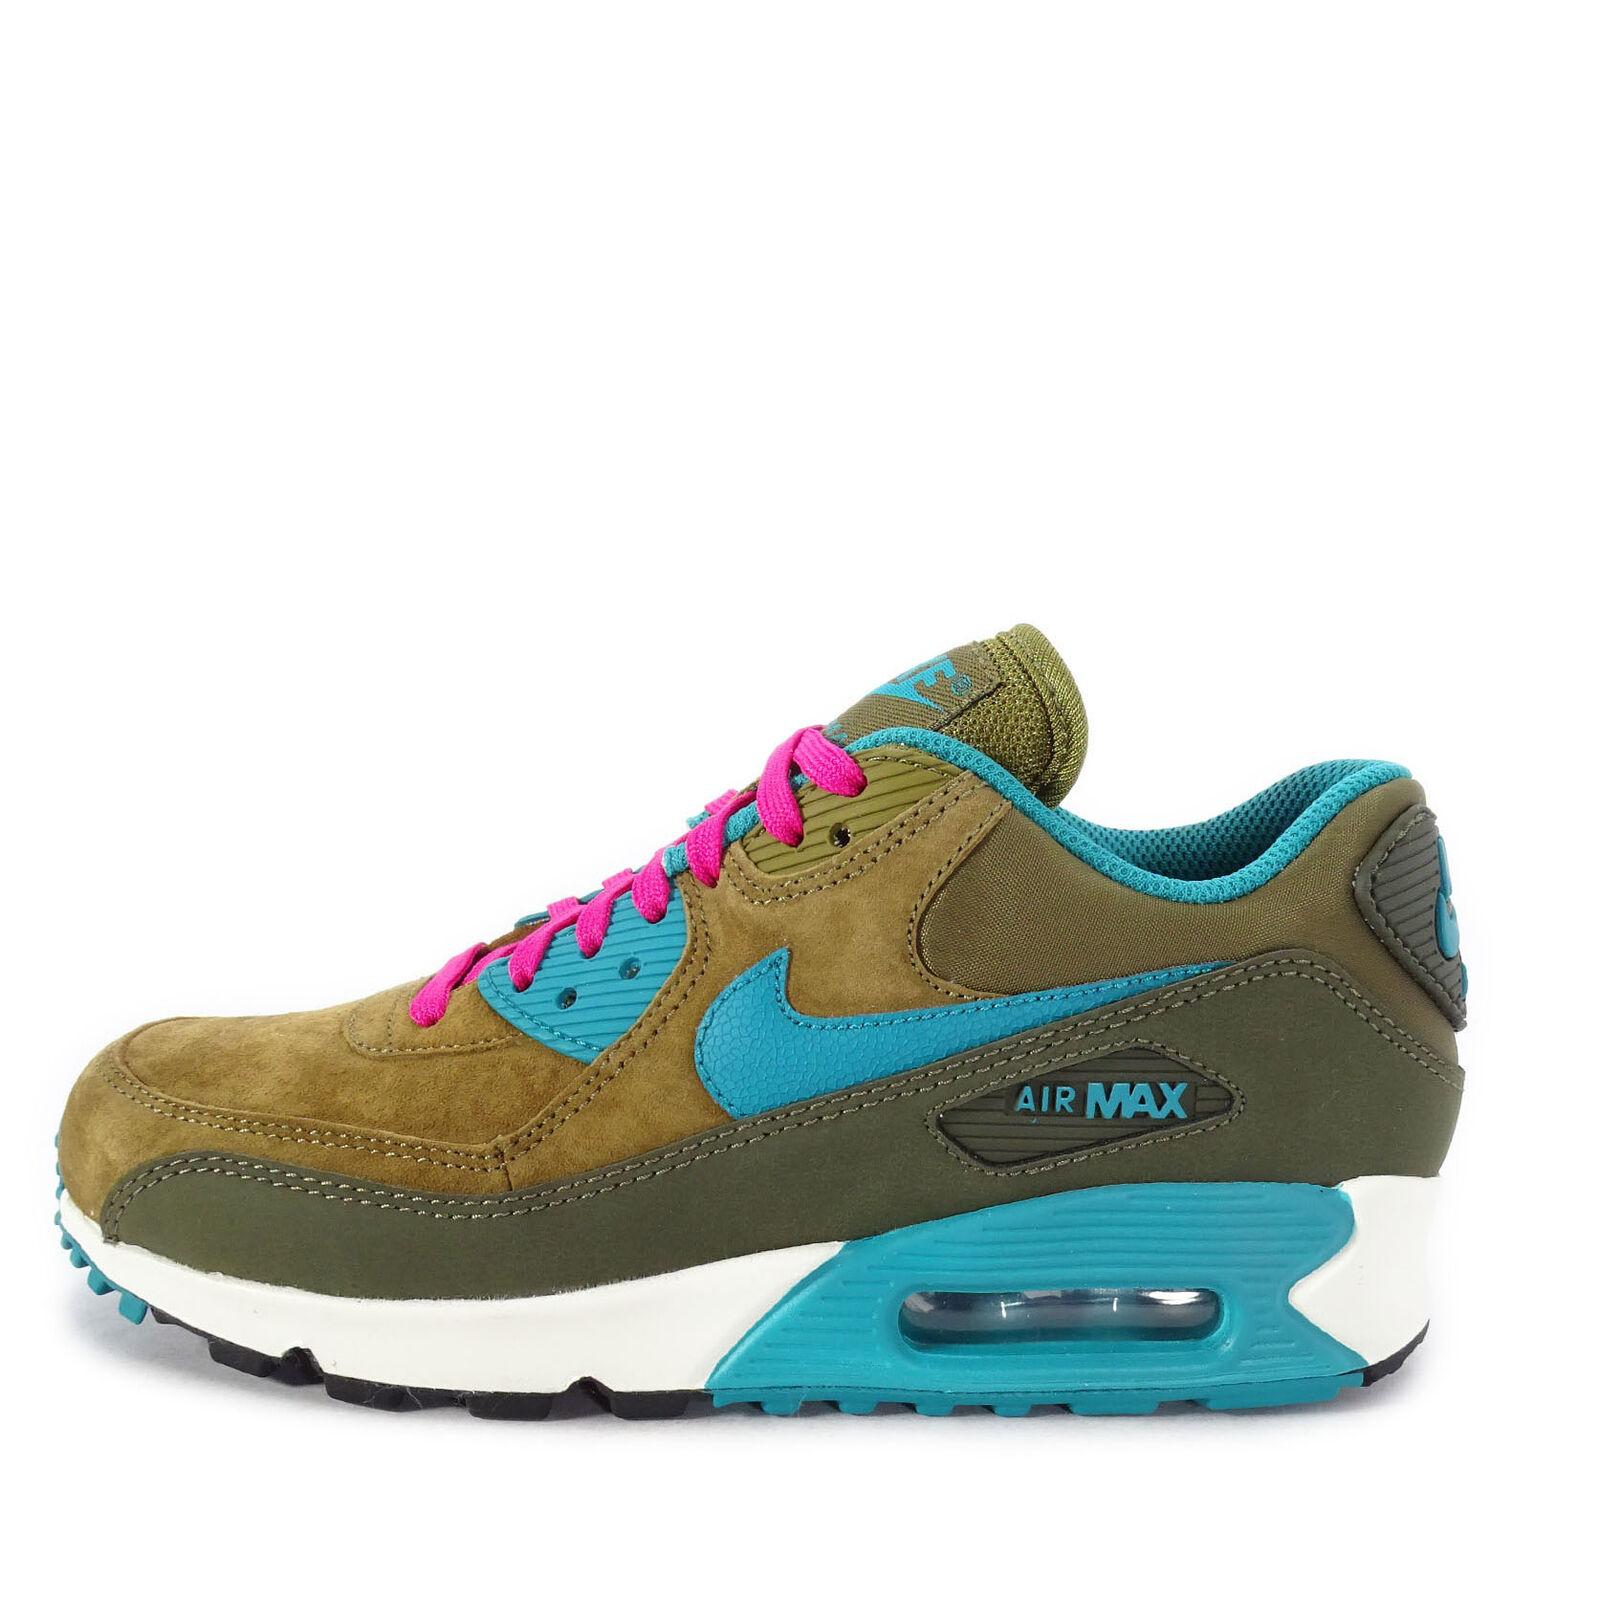 online retailer 7f8b0 12f7c Nike WMNS Air Air Air Max 90 LTHR  768887-300  NSW Running Dark  Loden Emerald 67f1cf